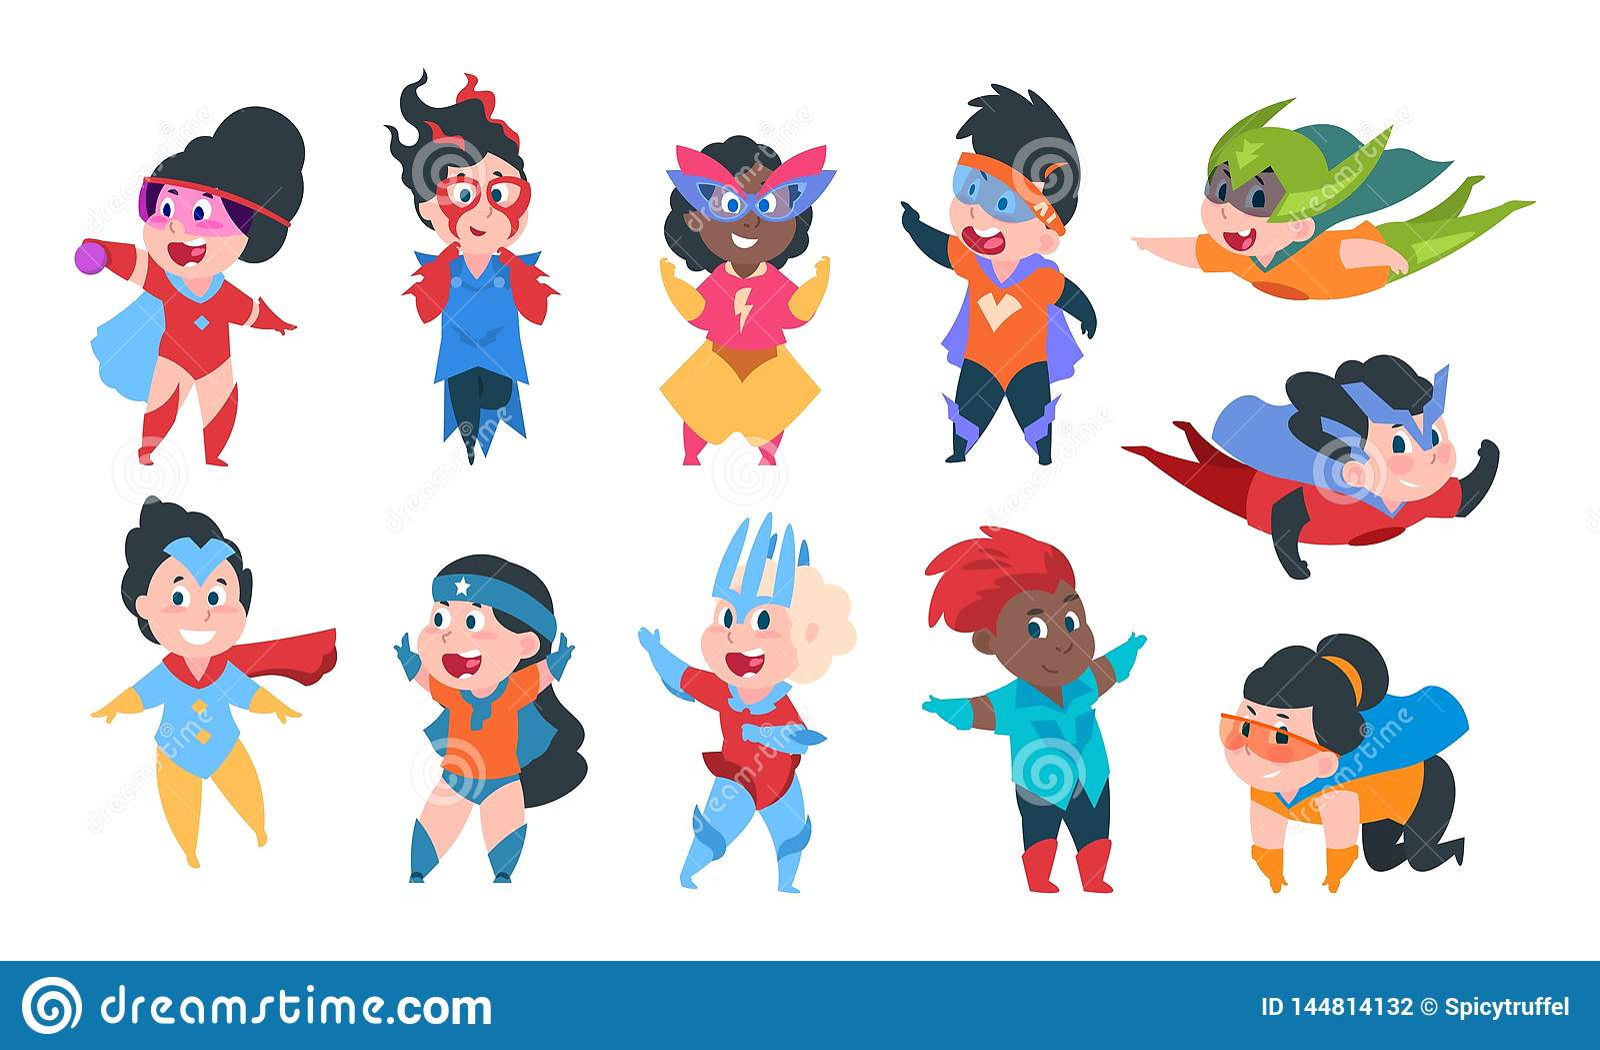 Superhero kids. Cartoon boys and girls characters in superhero comic costumes, cute children playing. Vector kids